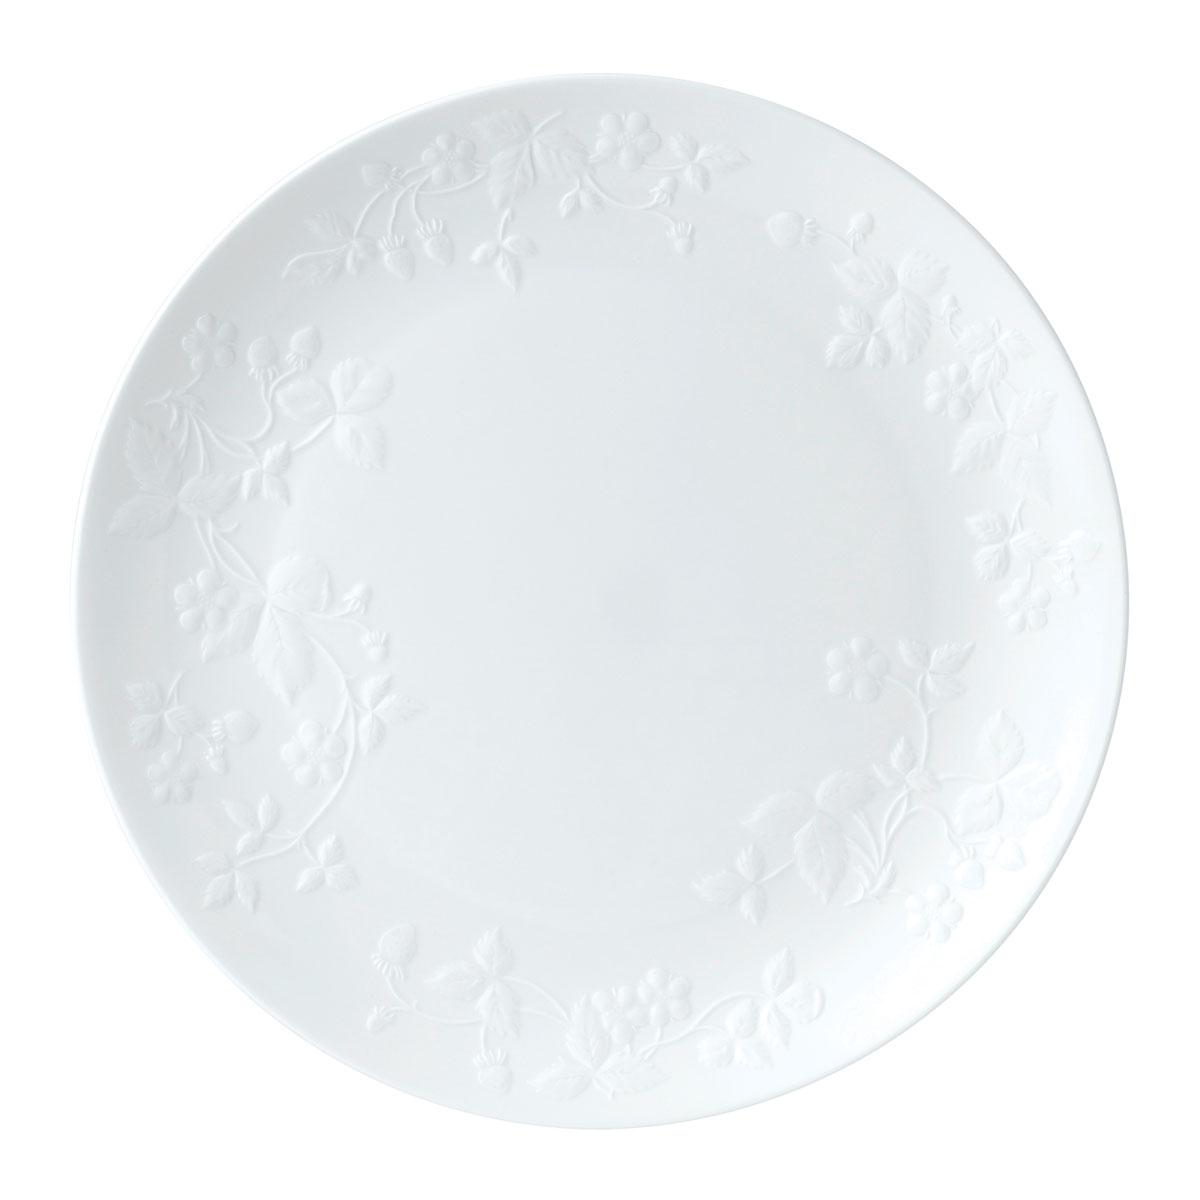 Wedgwood Wild Strawberry White Dinner Plate, Single